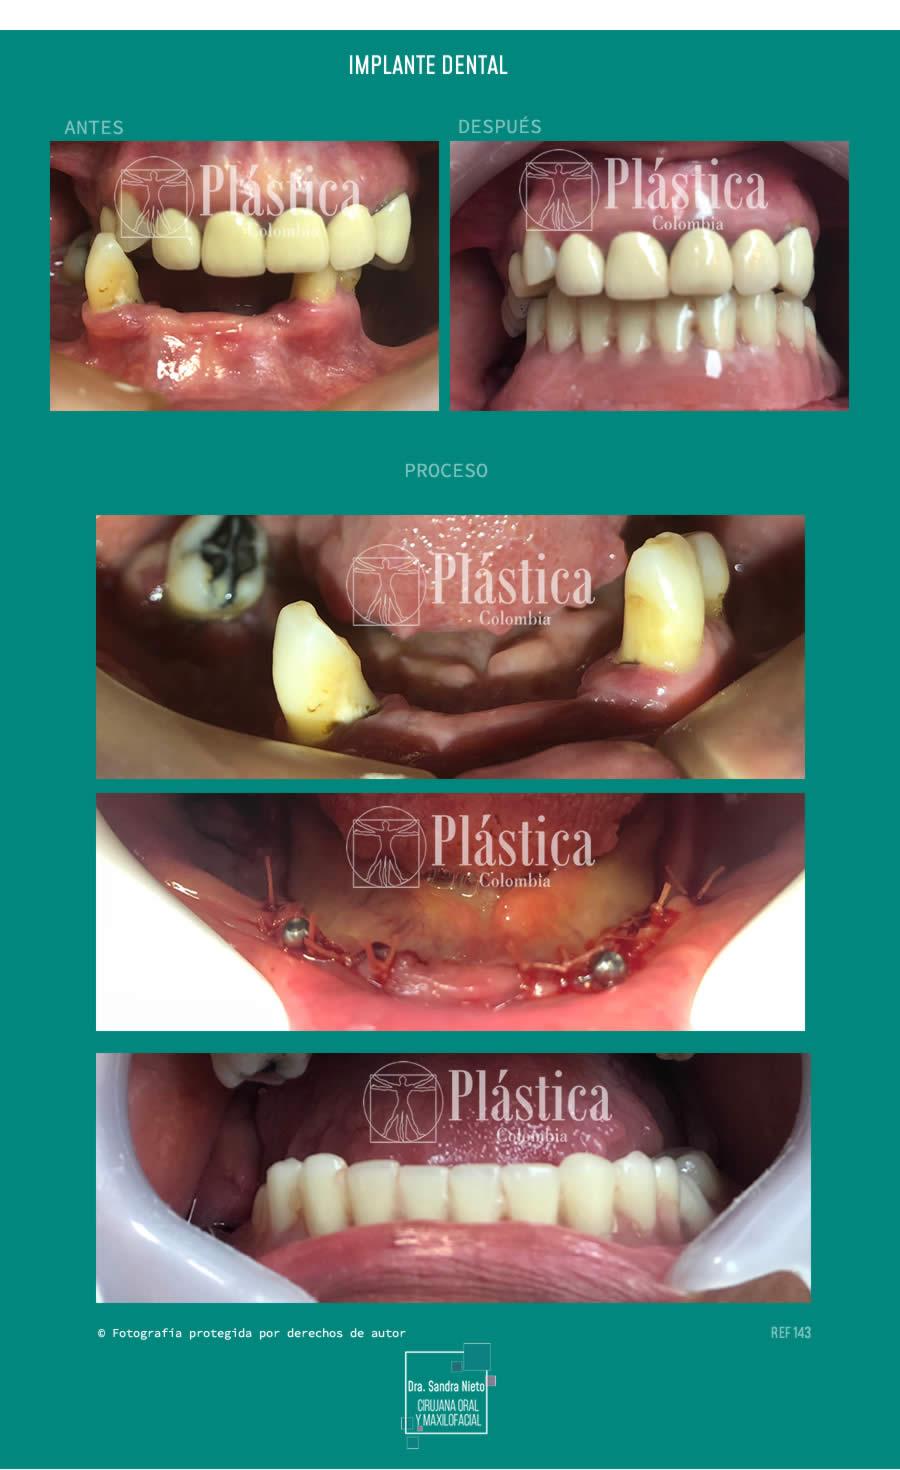 Implante dental one piece